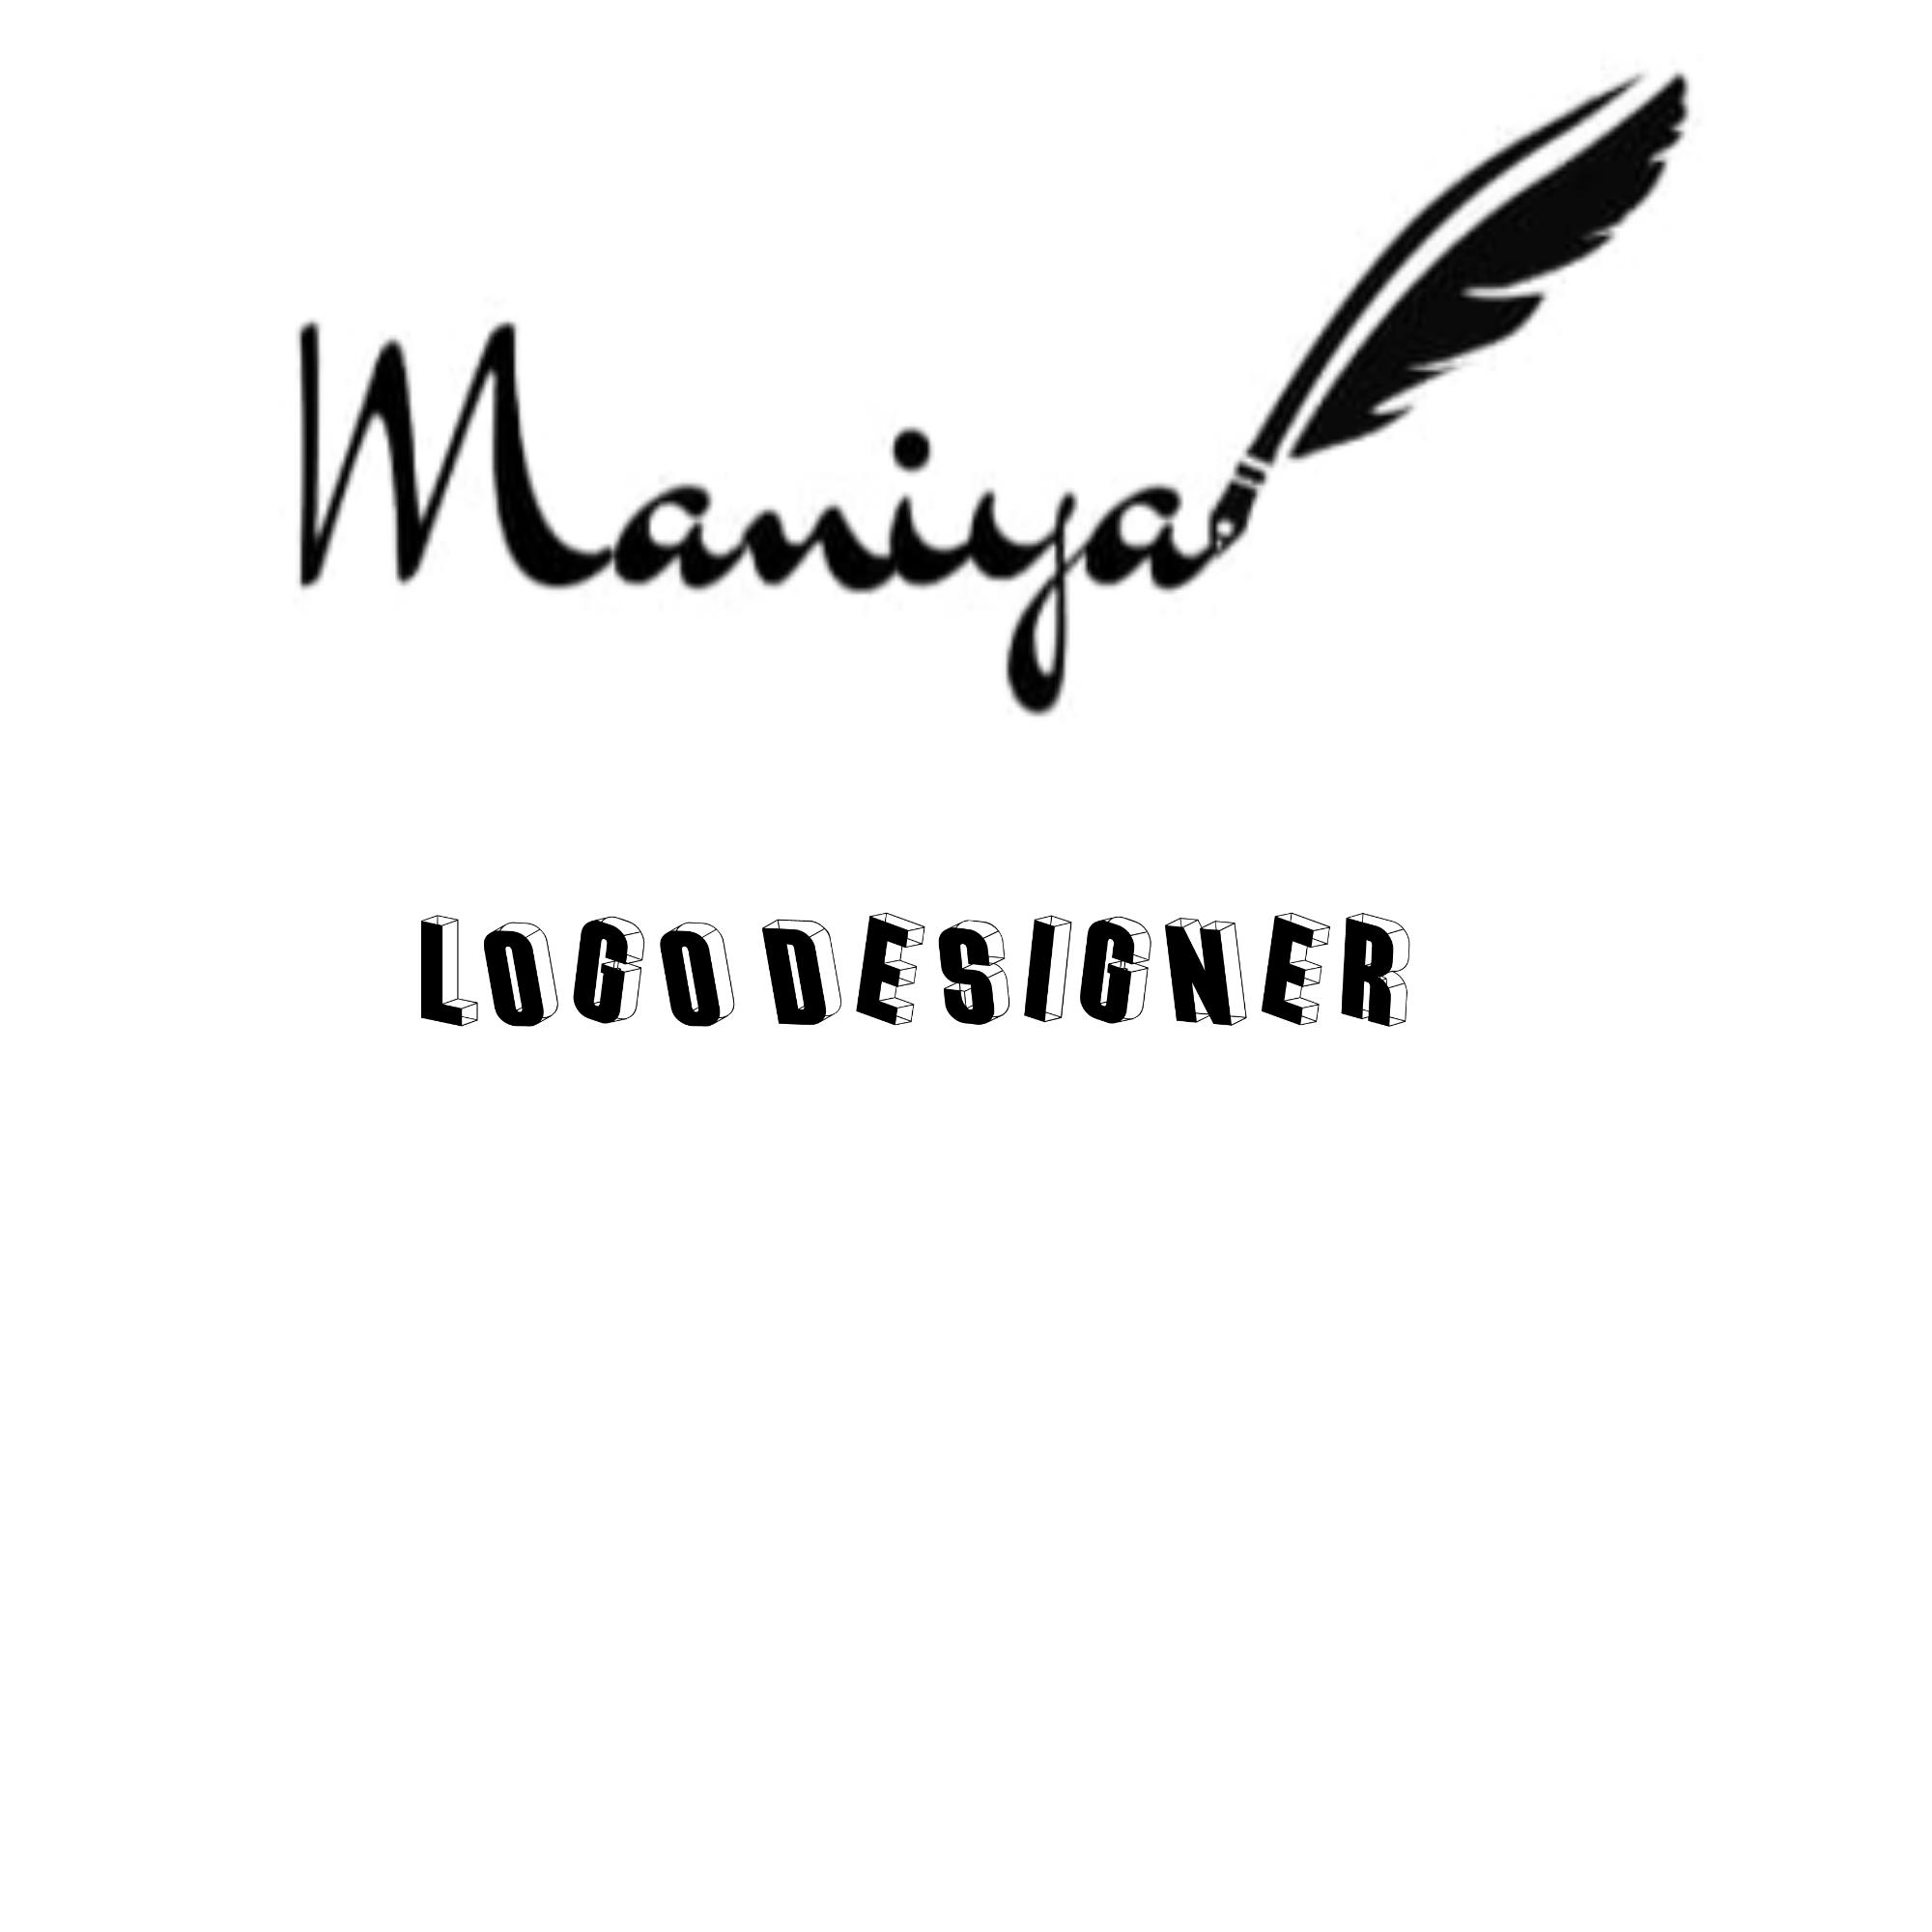 I am logo designer and logo creator skills Designer